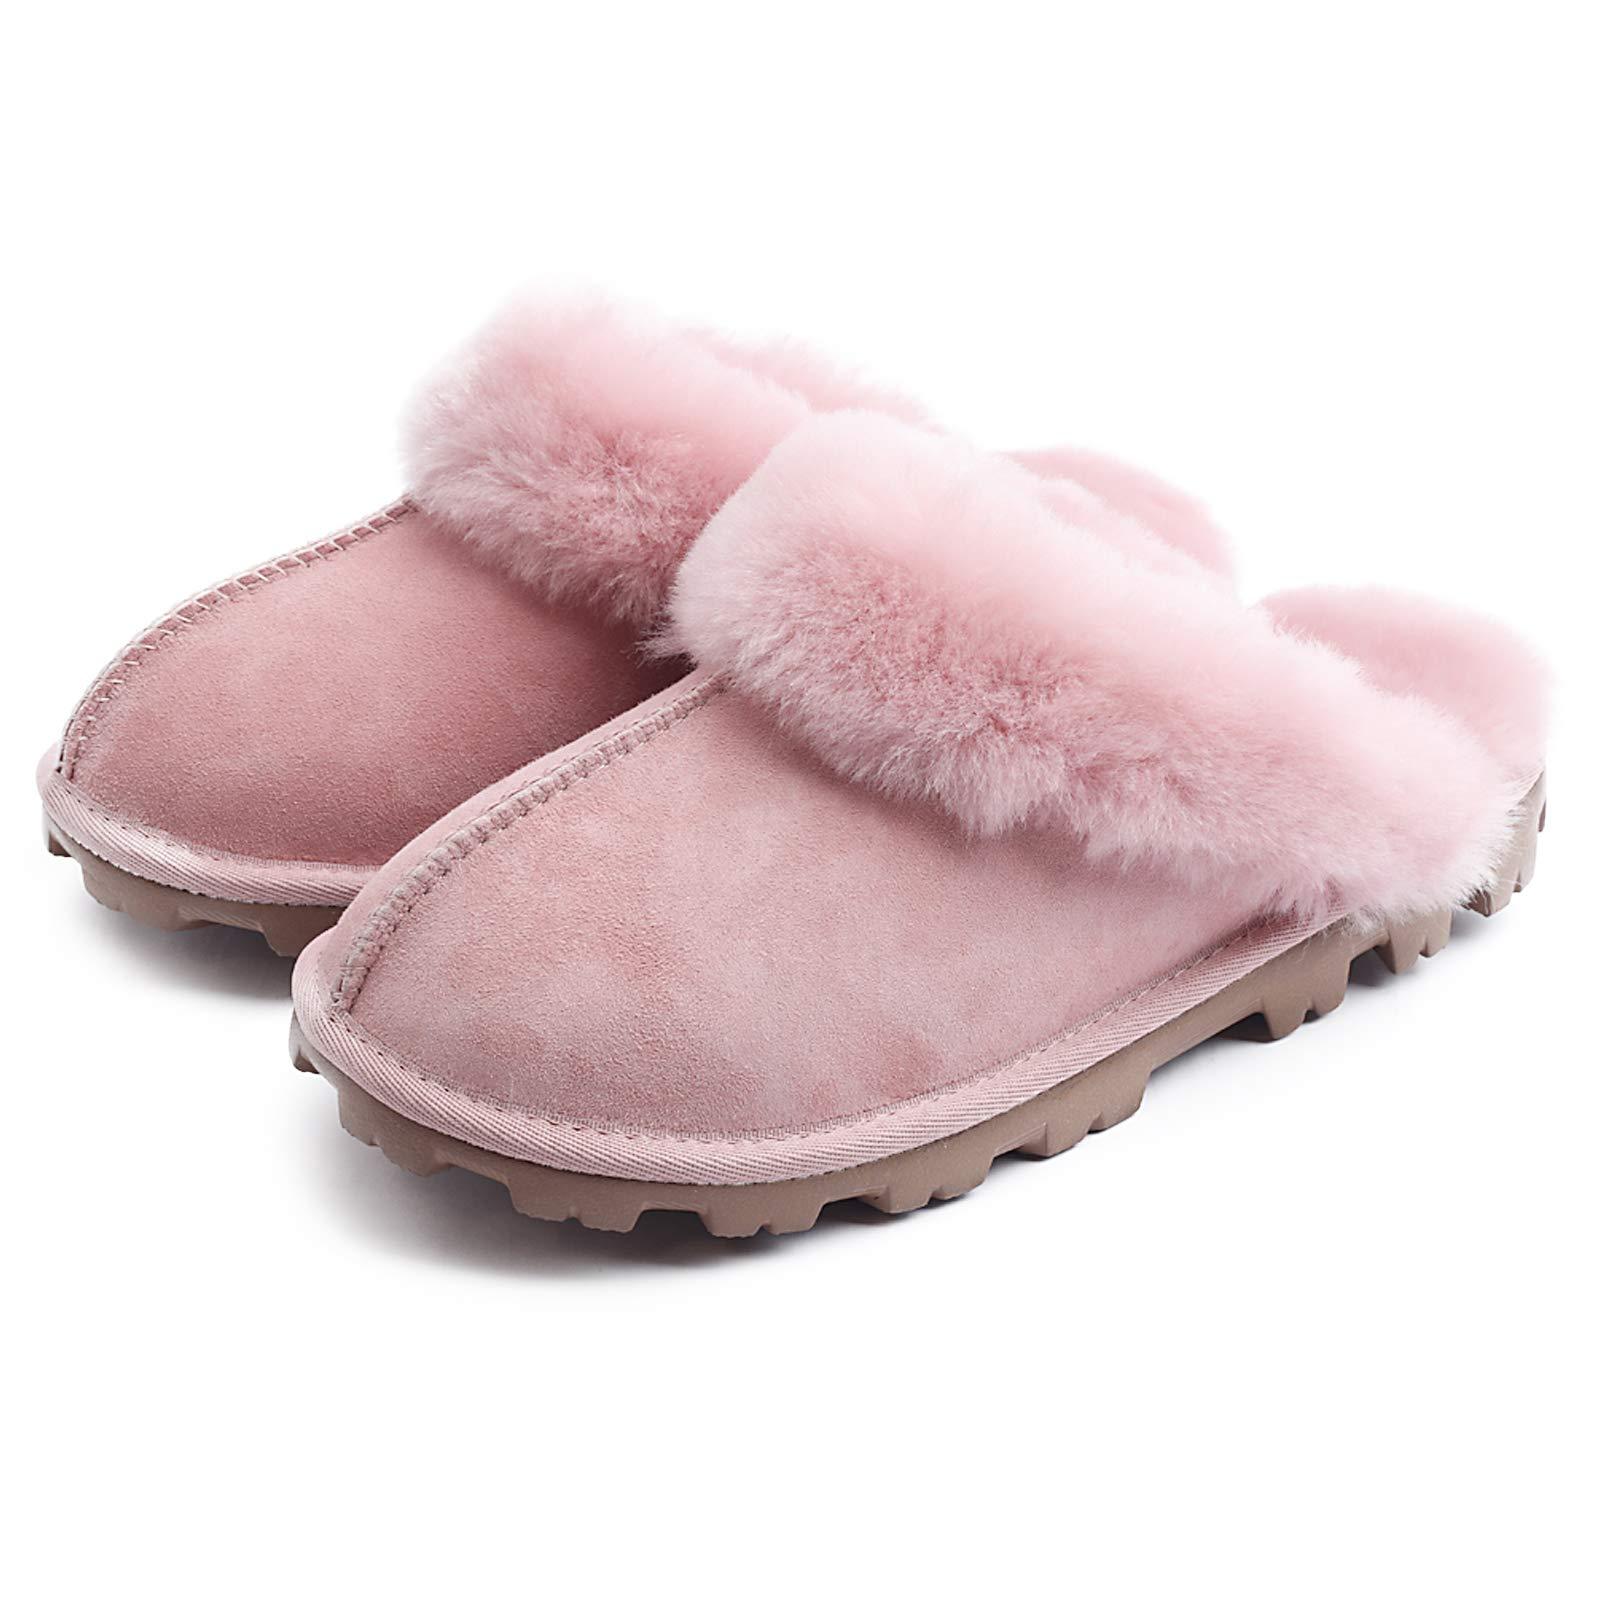 WaySoft Genuine Australian Sheepskin Women Slippers, Water-Resistant Warm and Fluffy Outdoor House Slippers for Women